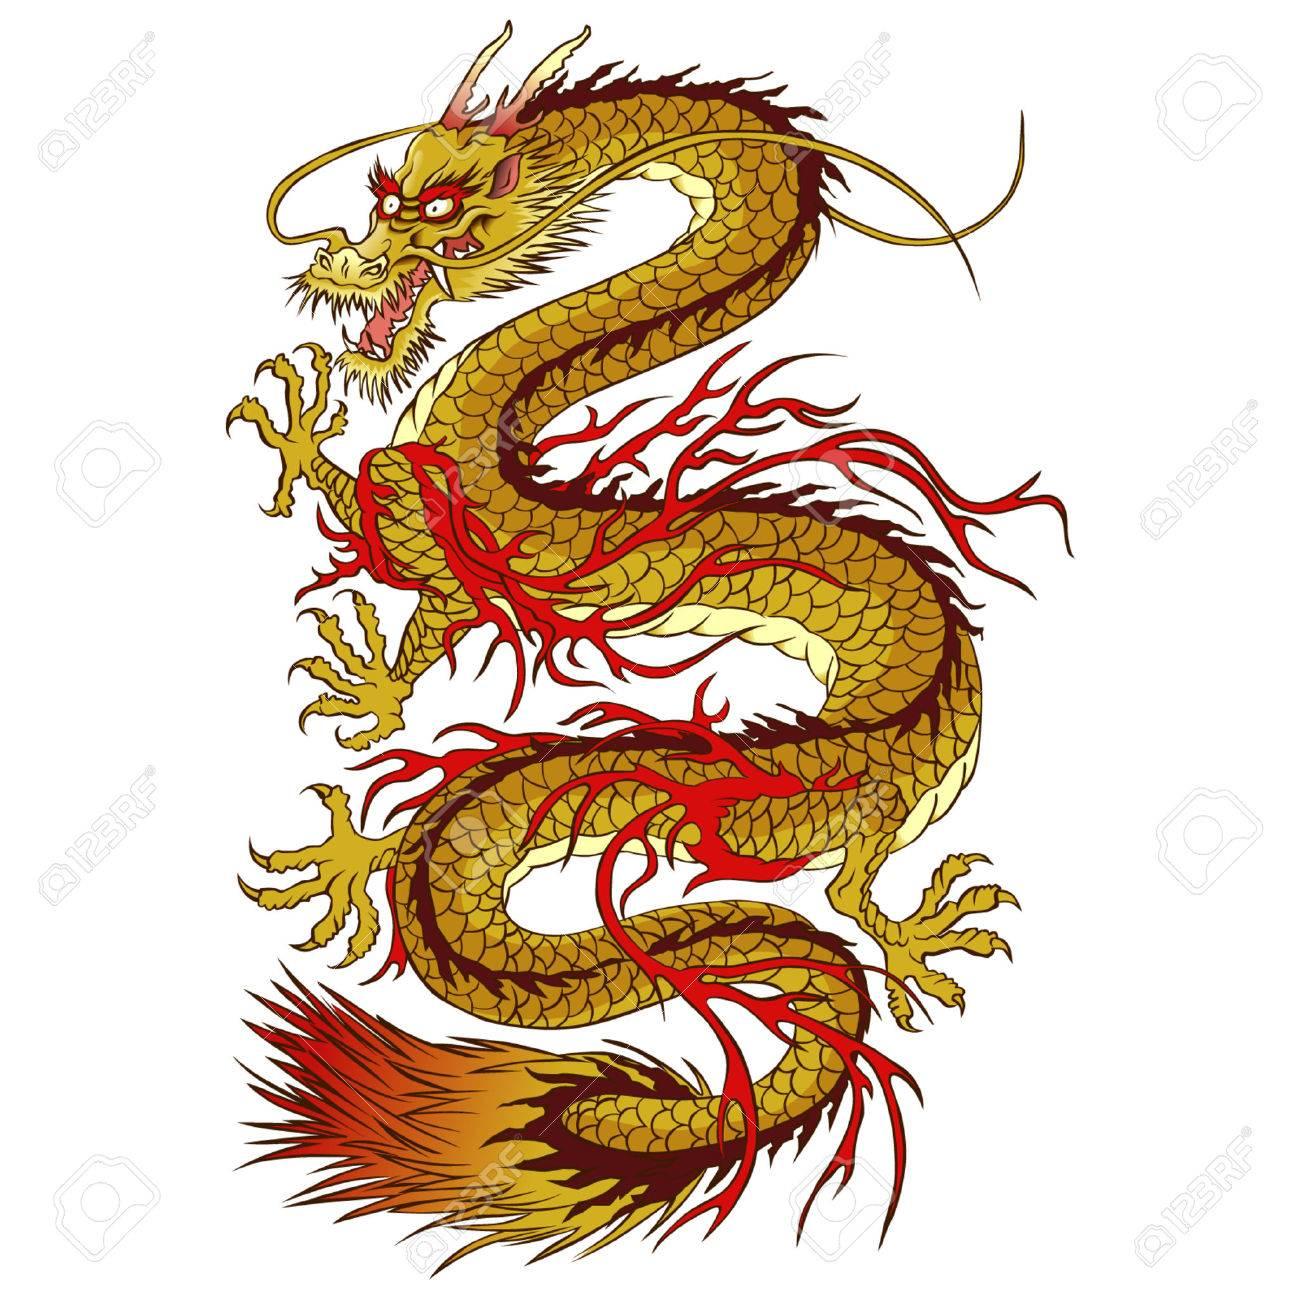 Golden dragon - 39342010